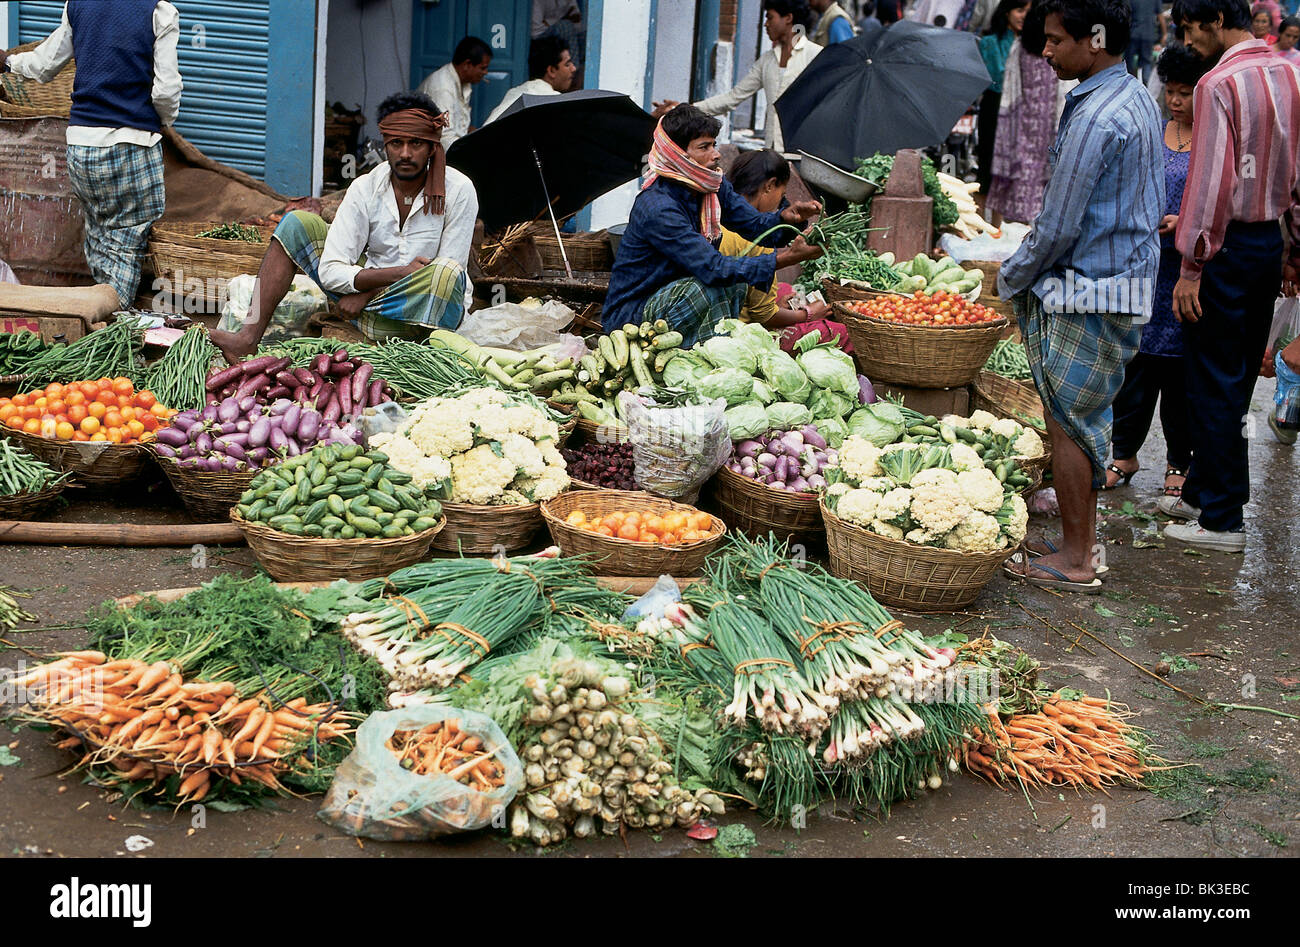 Vegetable market in Kathmandu, Nepal - Stock Image